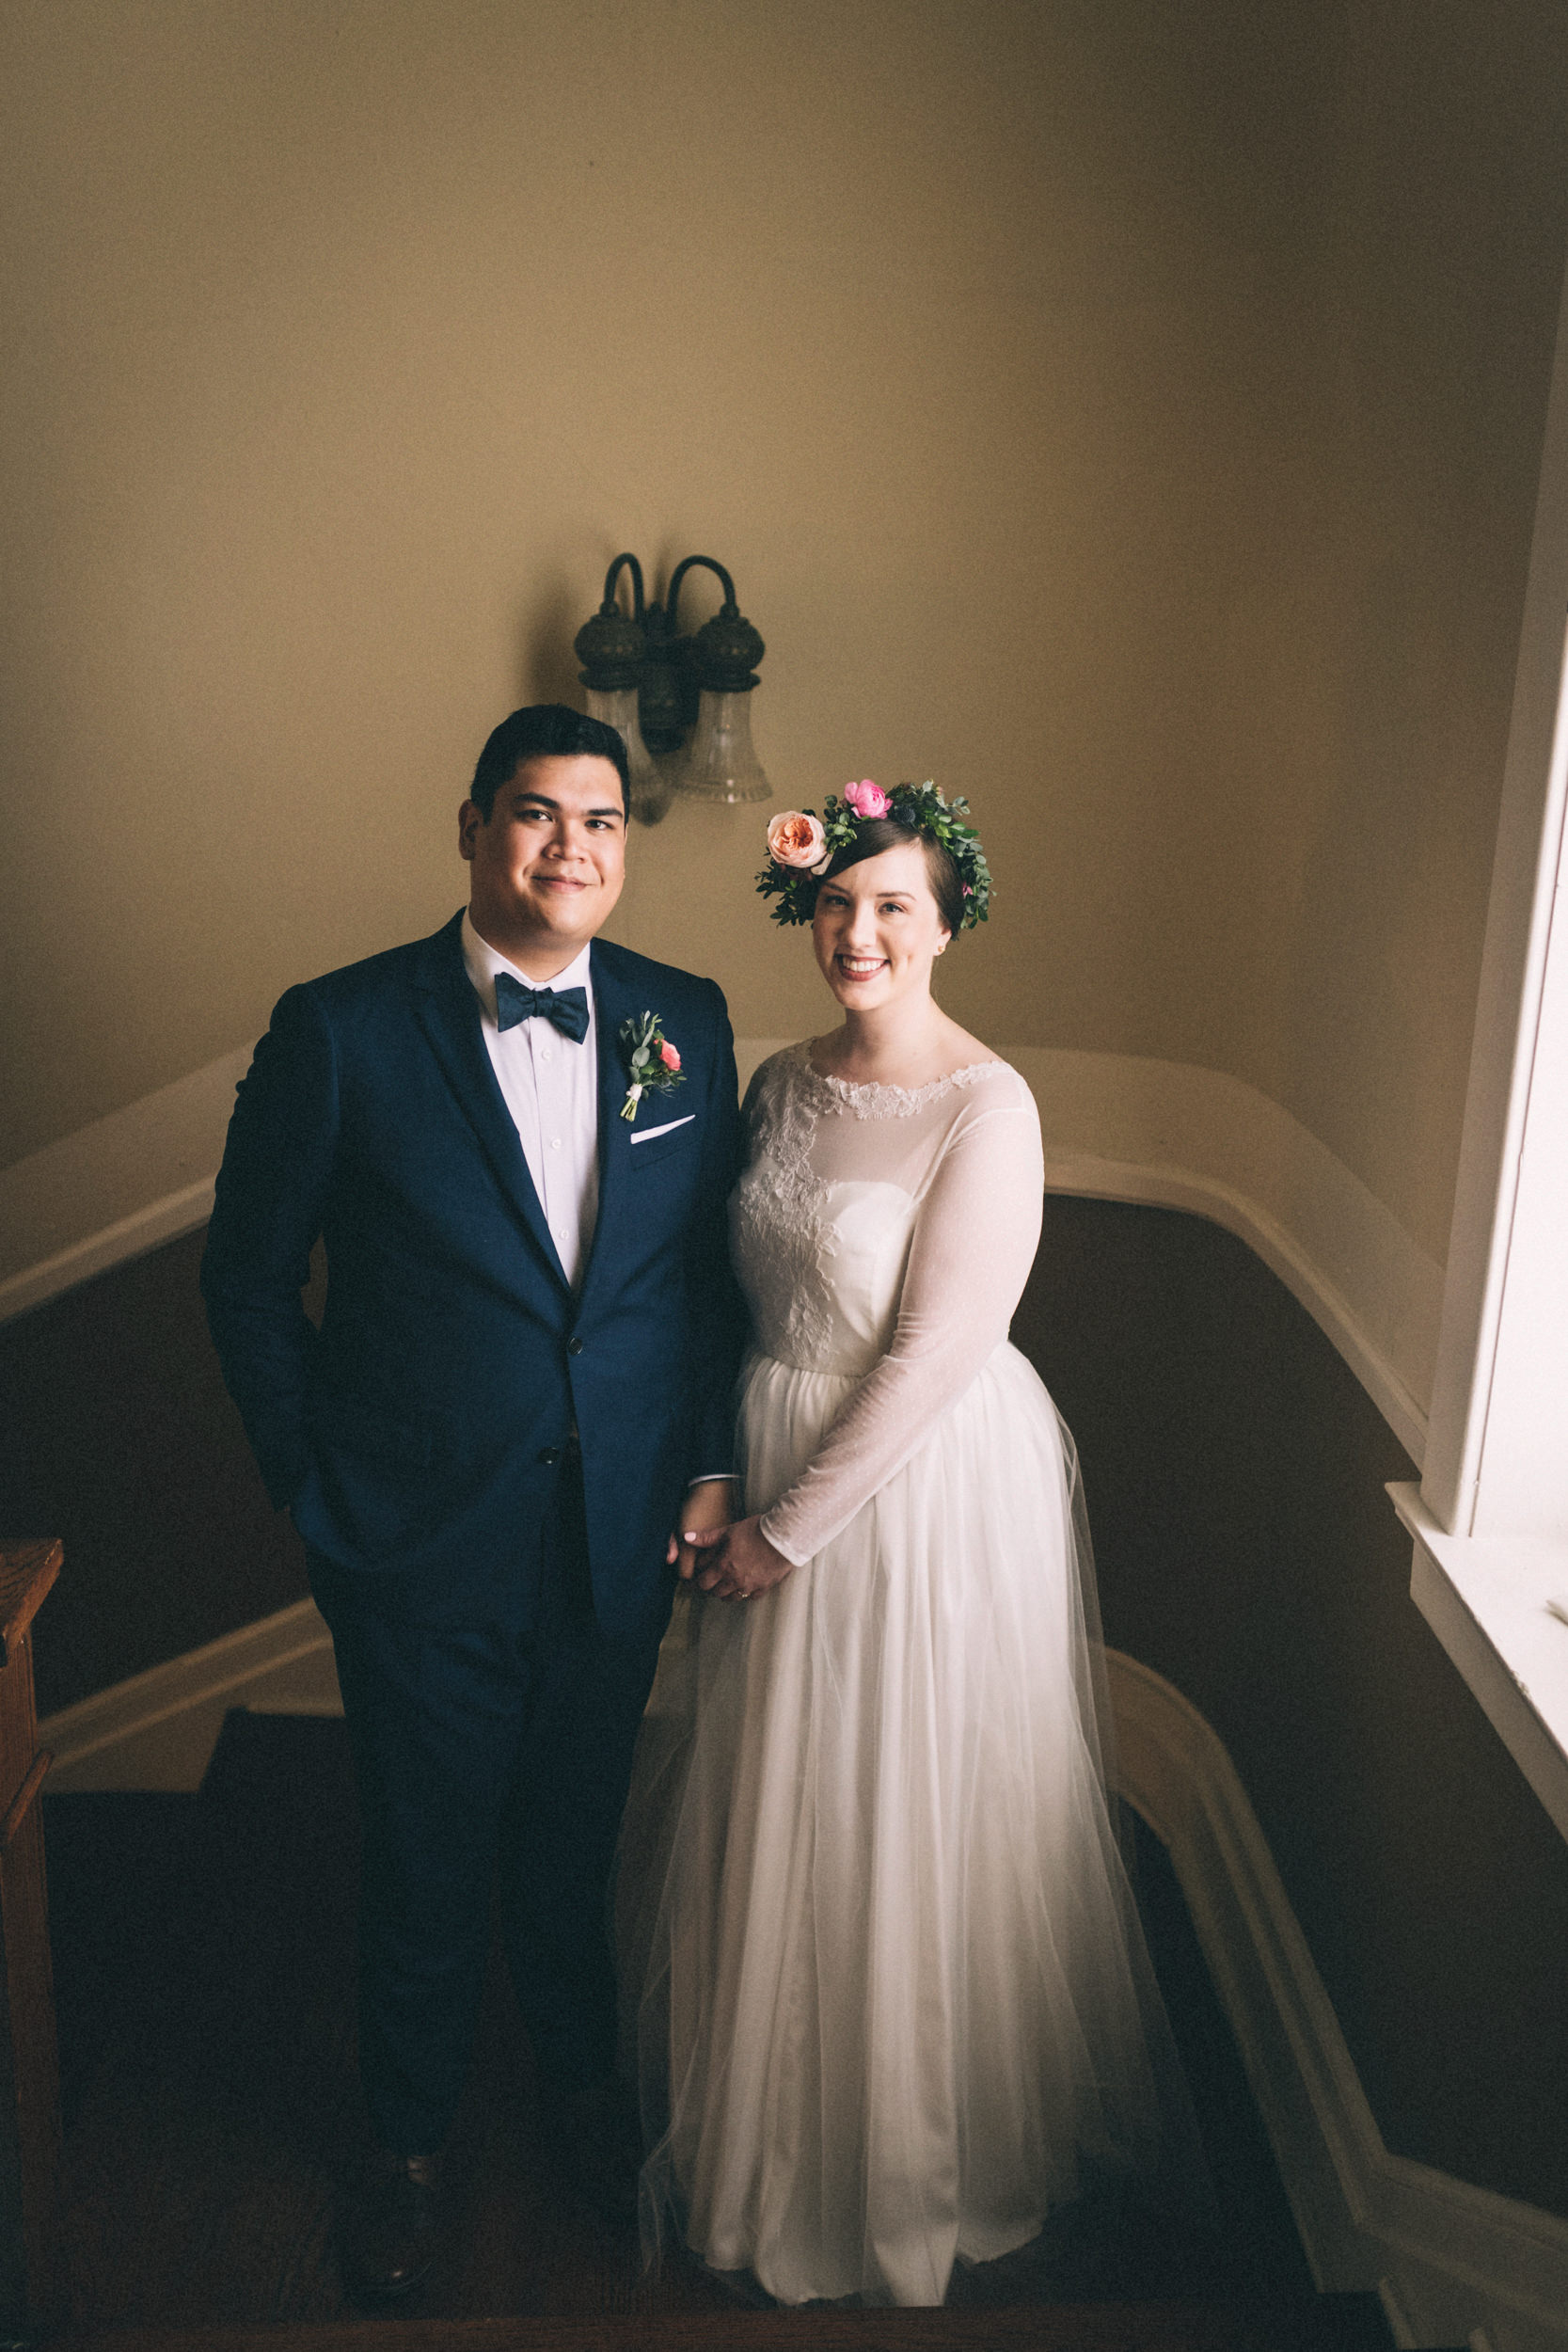 lauren-dean-wedding-grand-lodge-kentucky-sarah-katherine-davis-photography-153edit.jpg